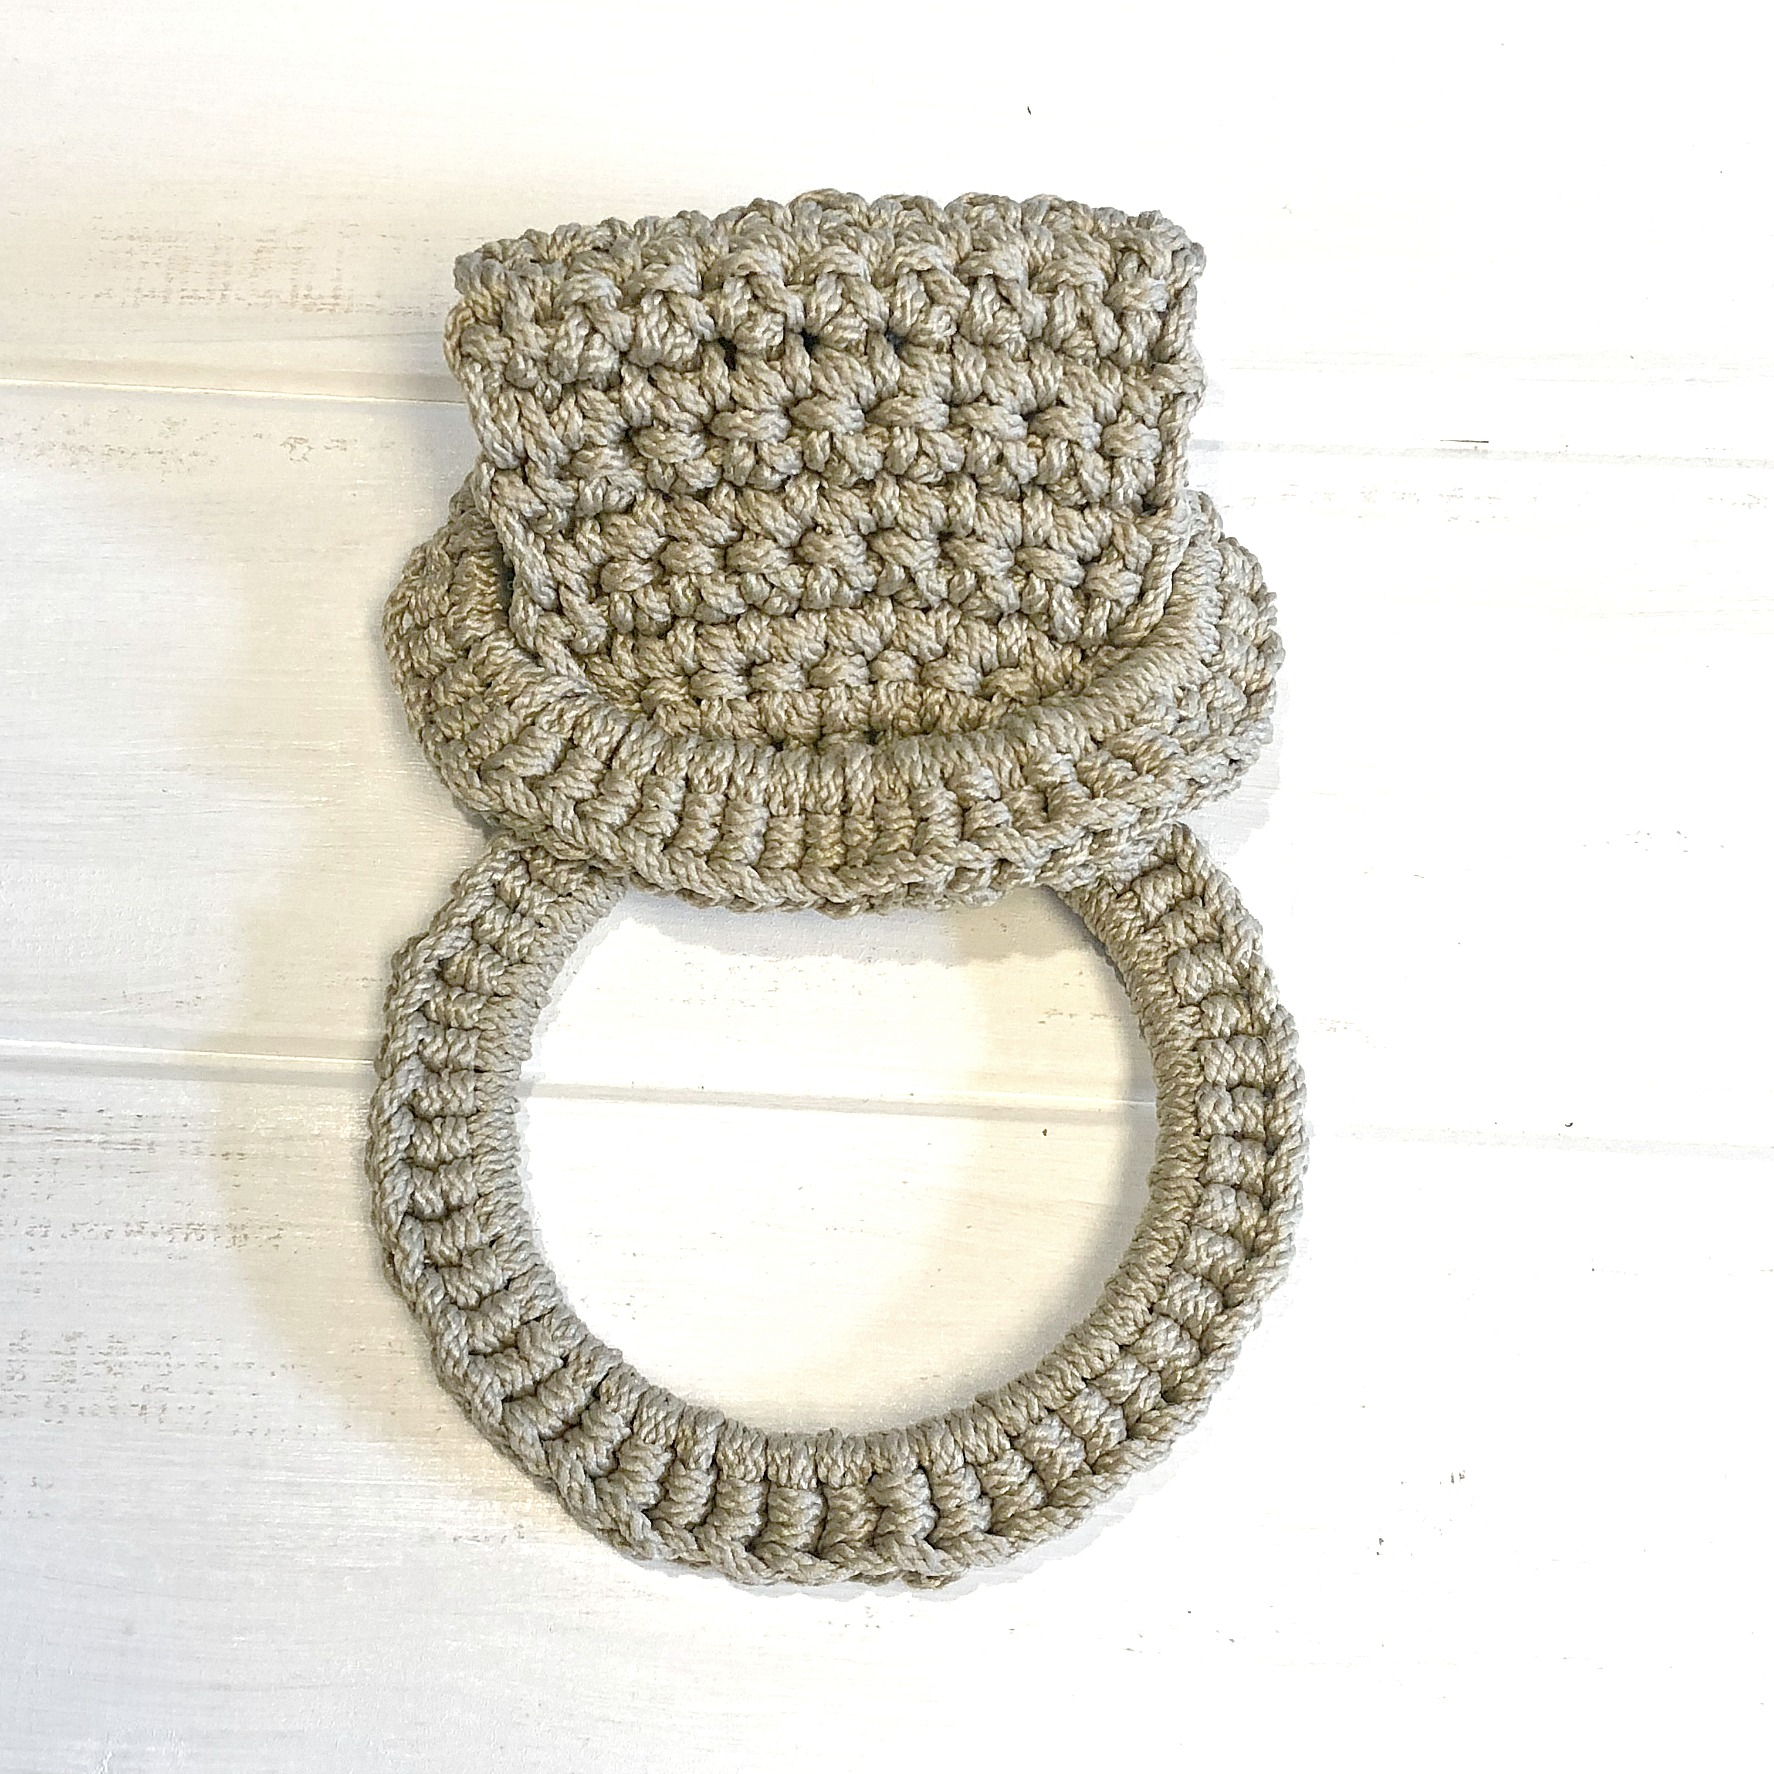 Herbal Tea Towel Ring - Crochet Pattern - The Roving Nomad